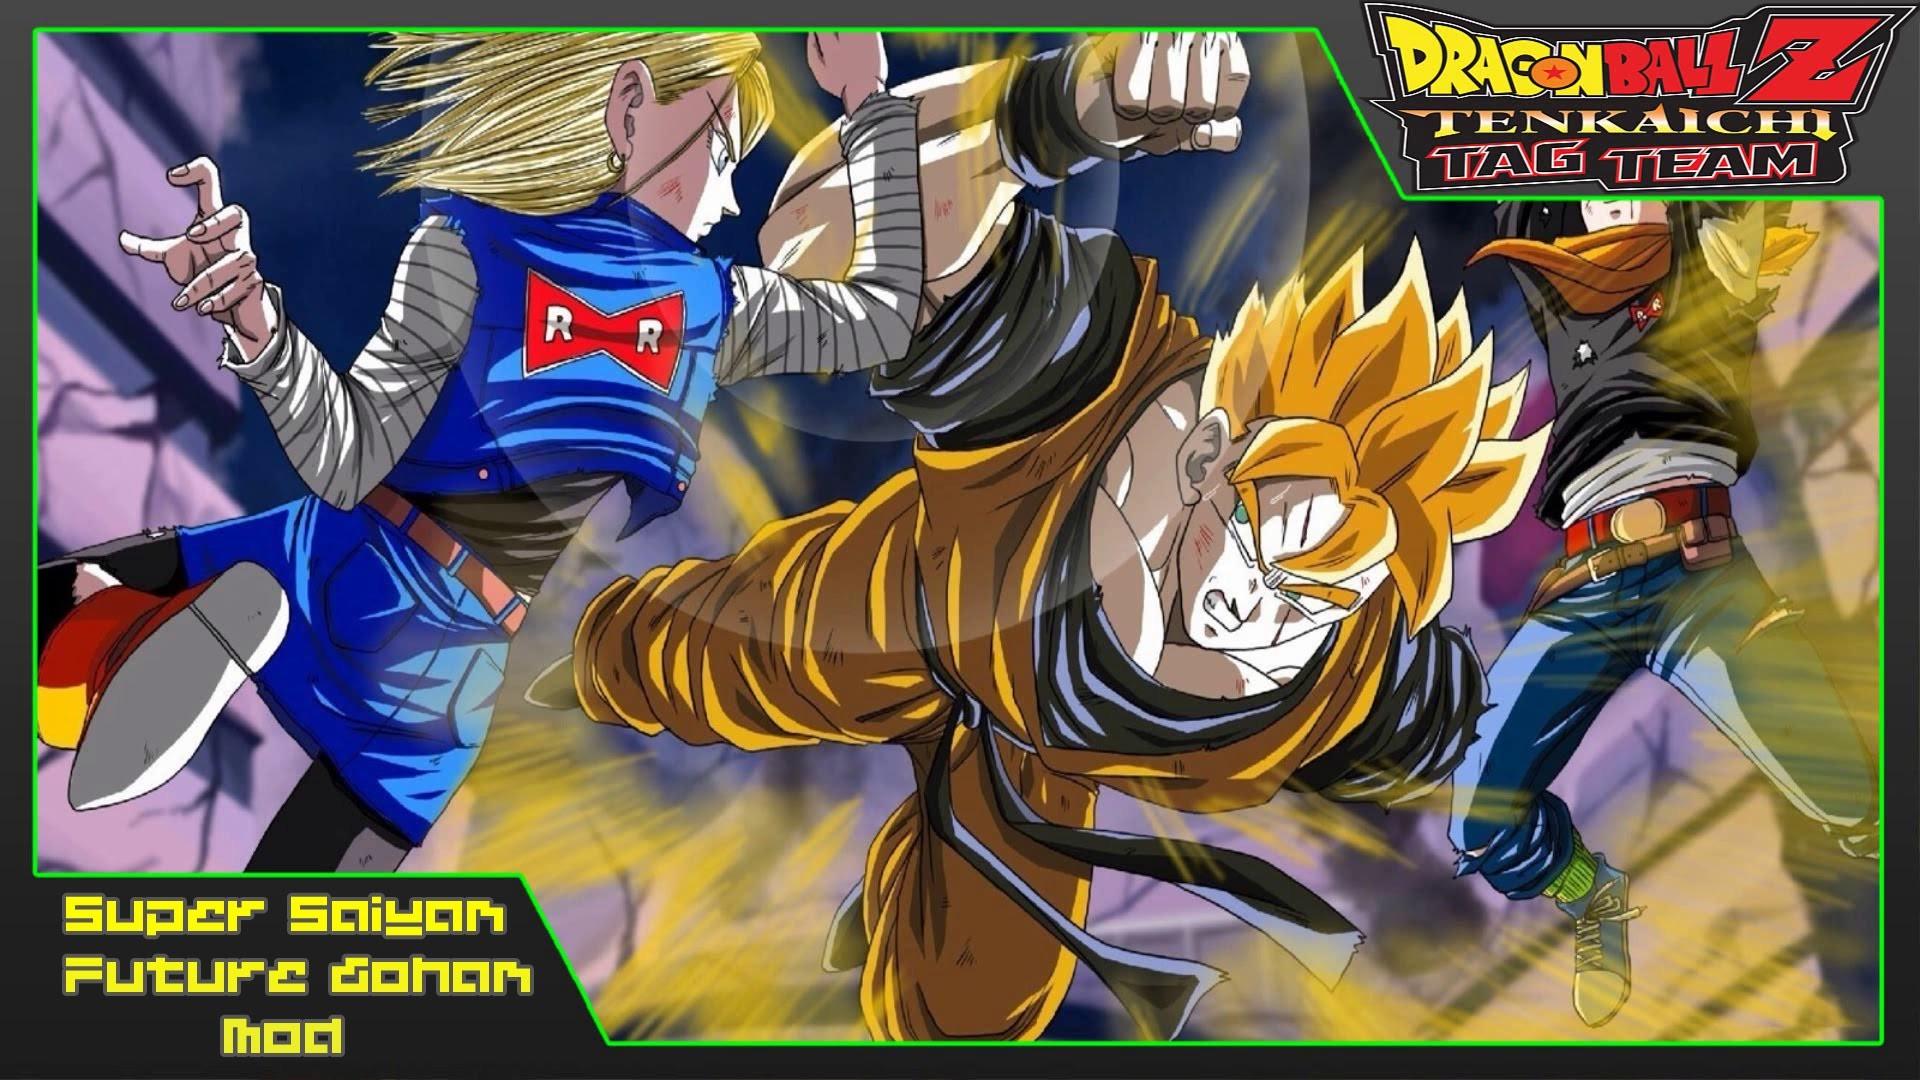 Dragon Ball Z Tenkaichi Tag Team | Super Saiyan Future Gohan (MOD) Gameplay  – YouTube